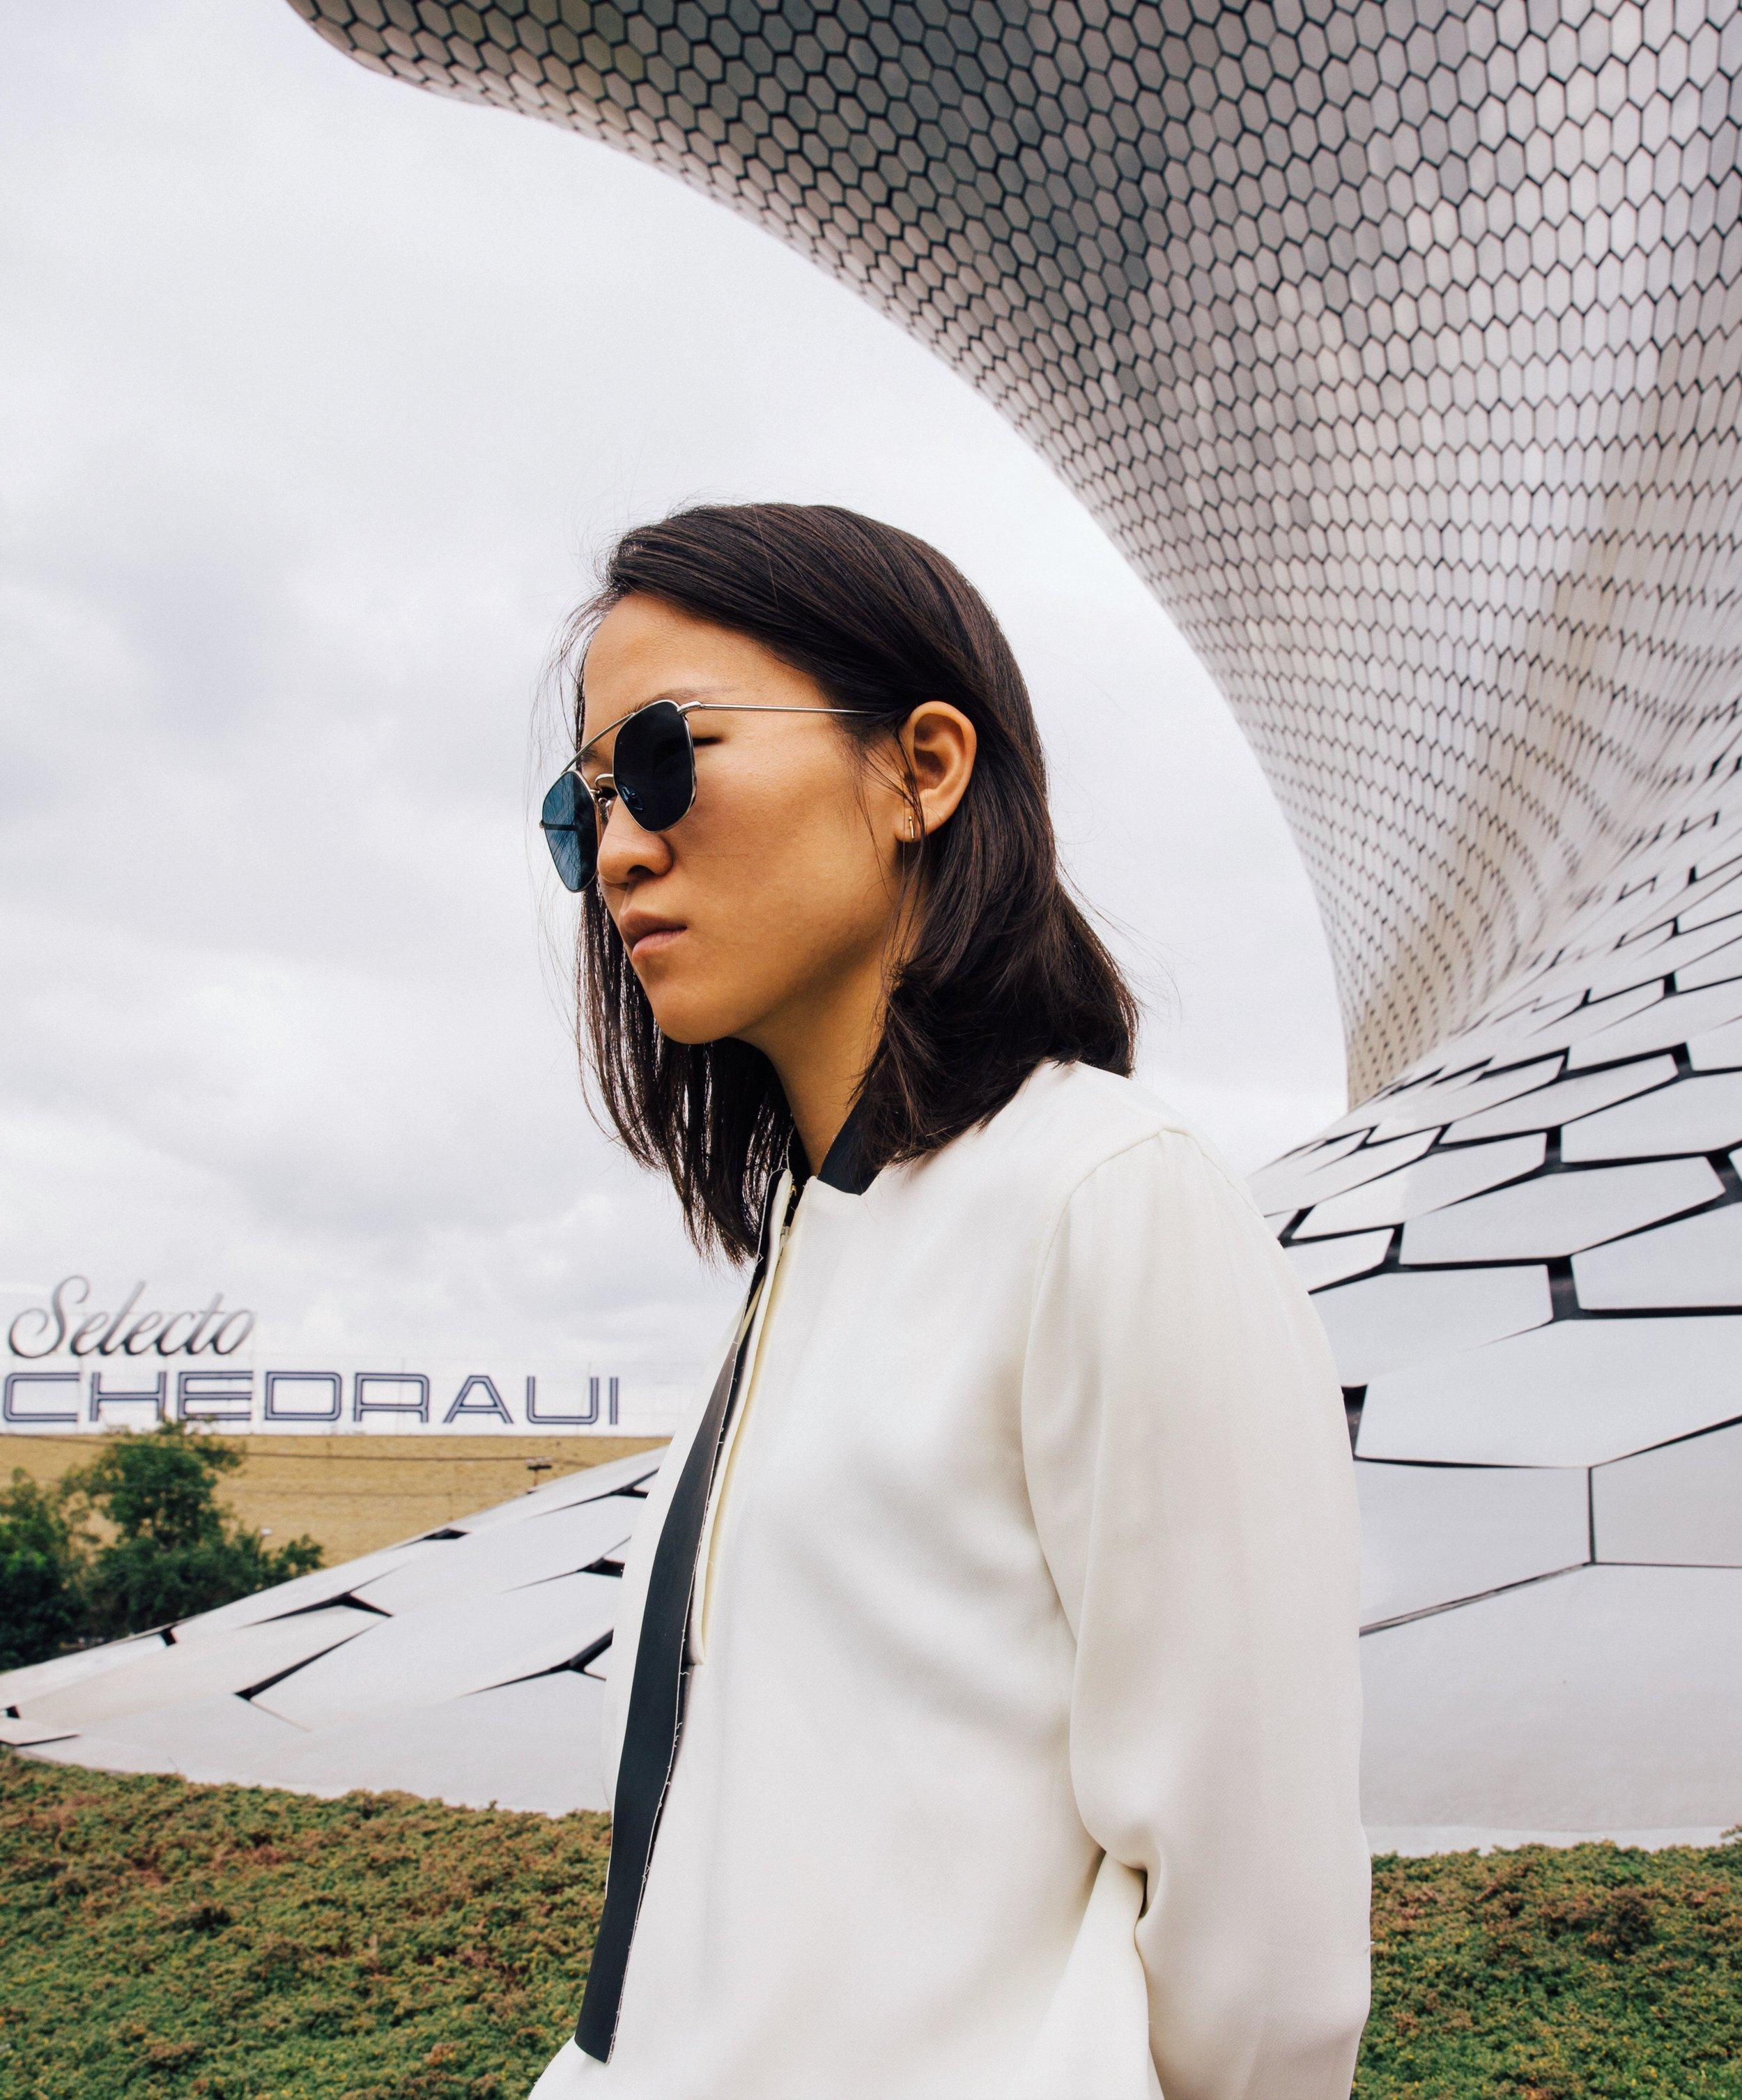 alexander wang blouse, ahlem sunglasses, loren stewart rod studs  photo by  Daniel Han